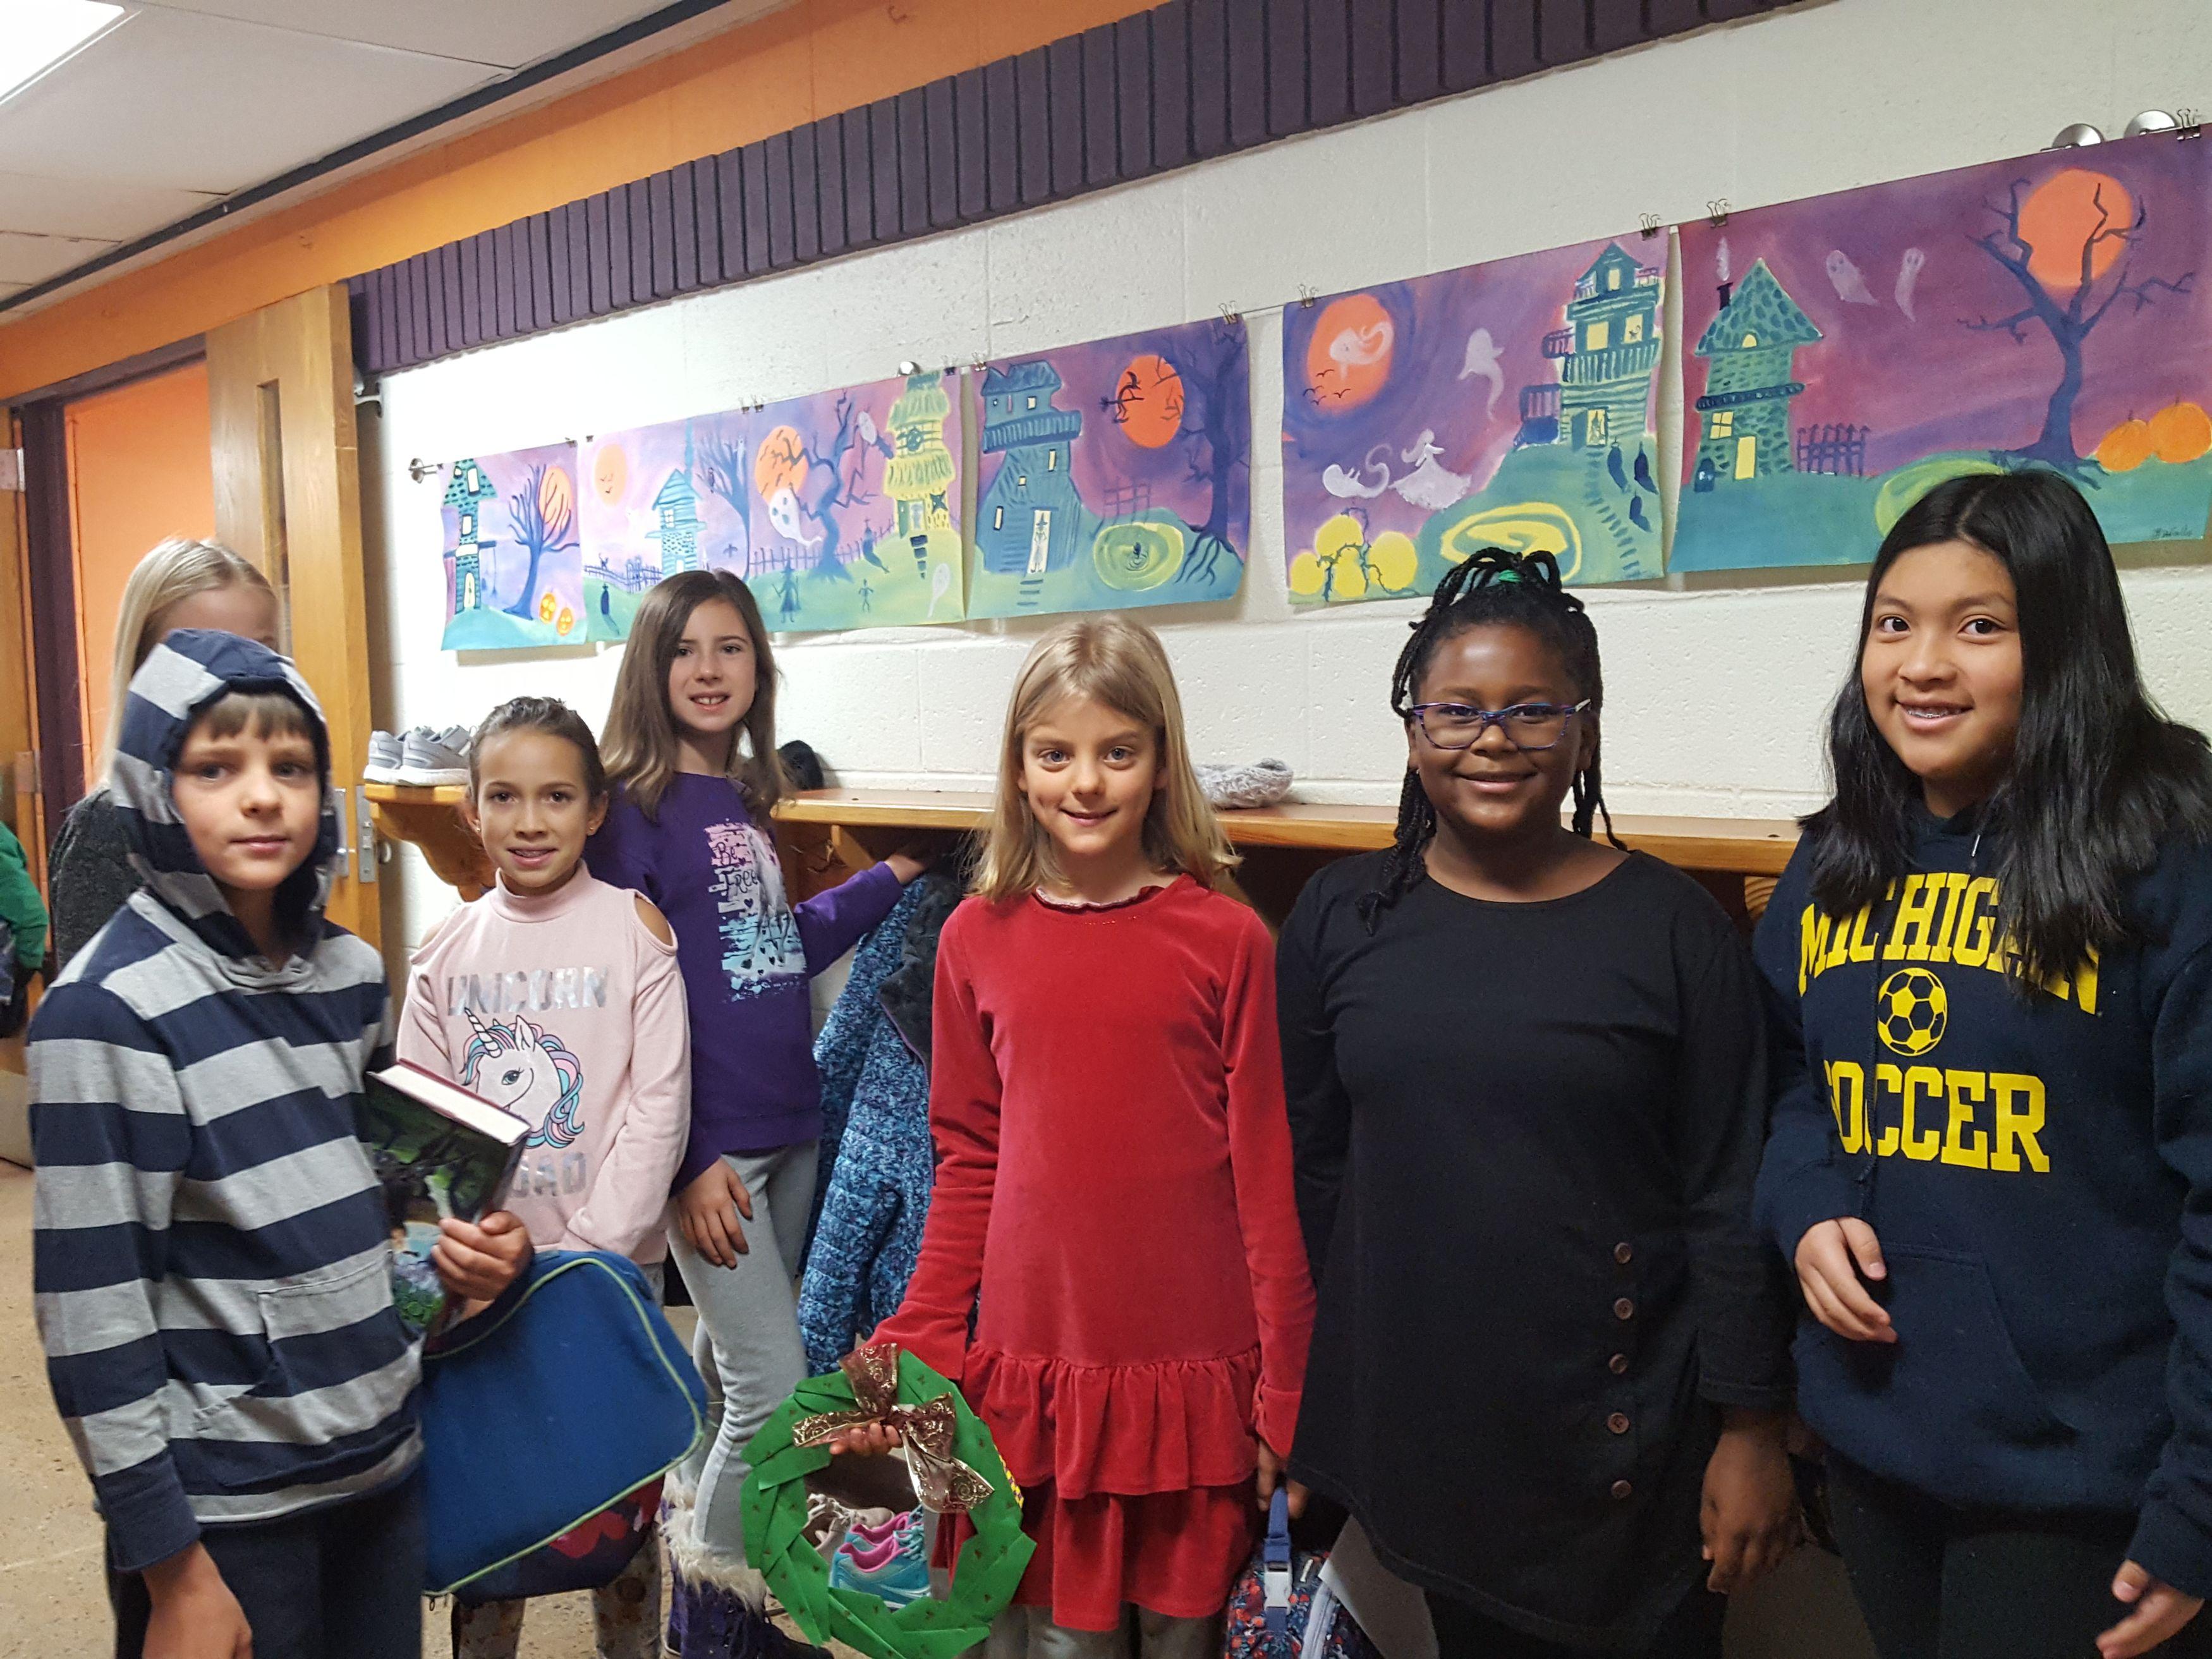 Group of students in school hallway